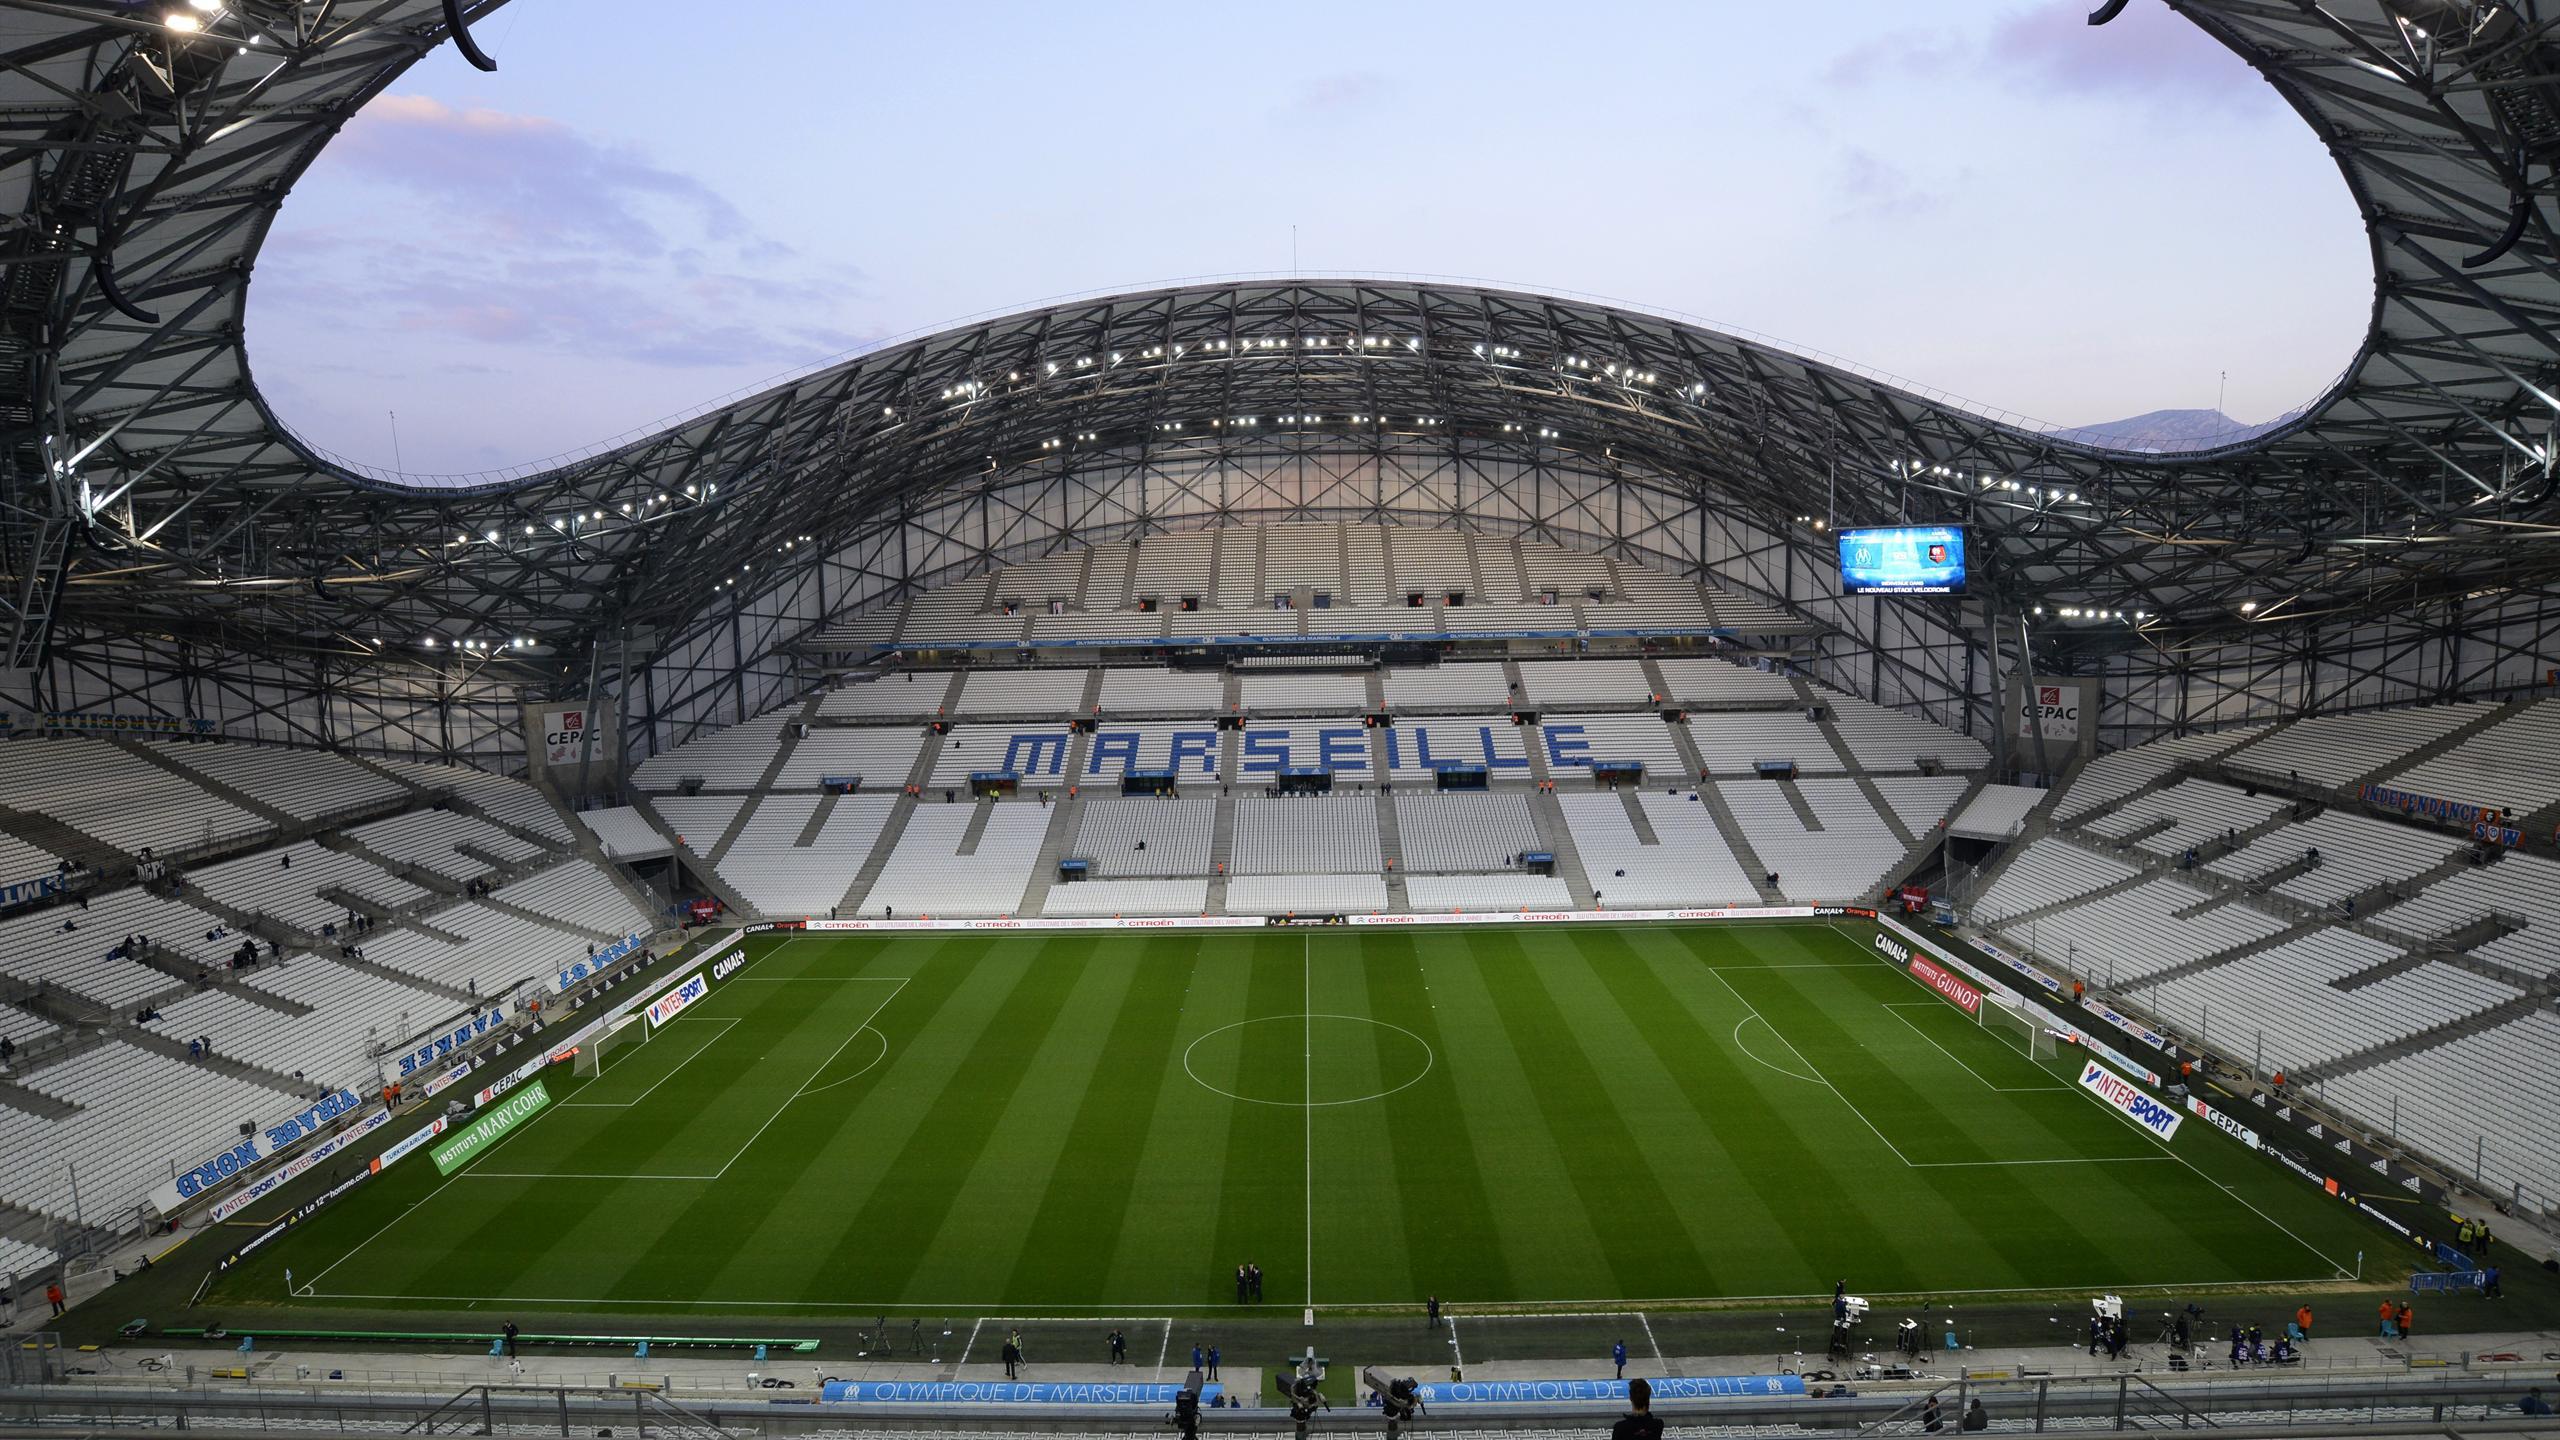 Notre top 10 des stades de l 39 euro 2016 eurosport for Garage de la riviera villeneuve d ascq